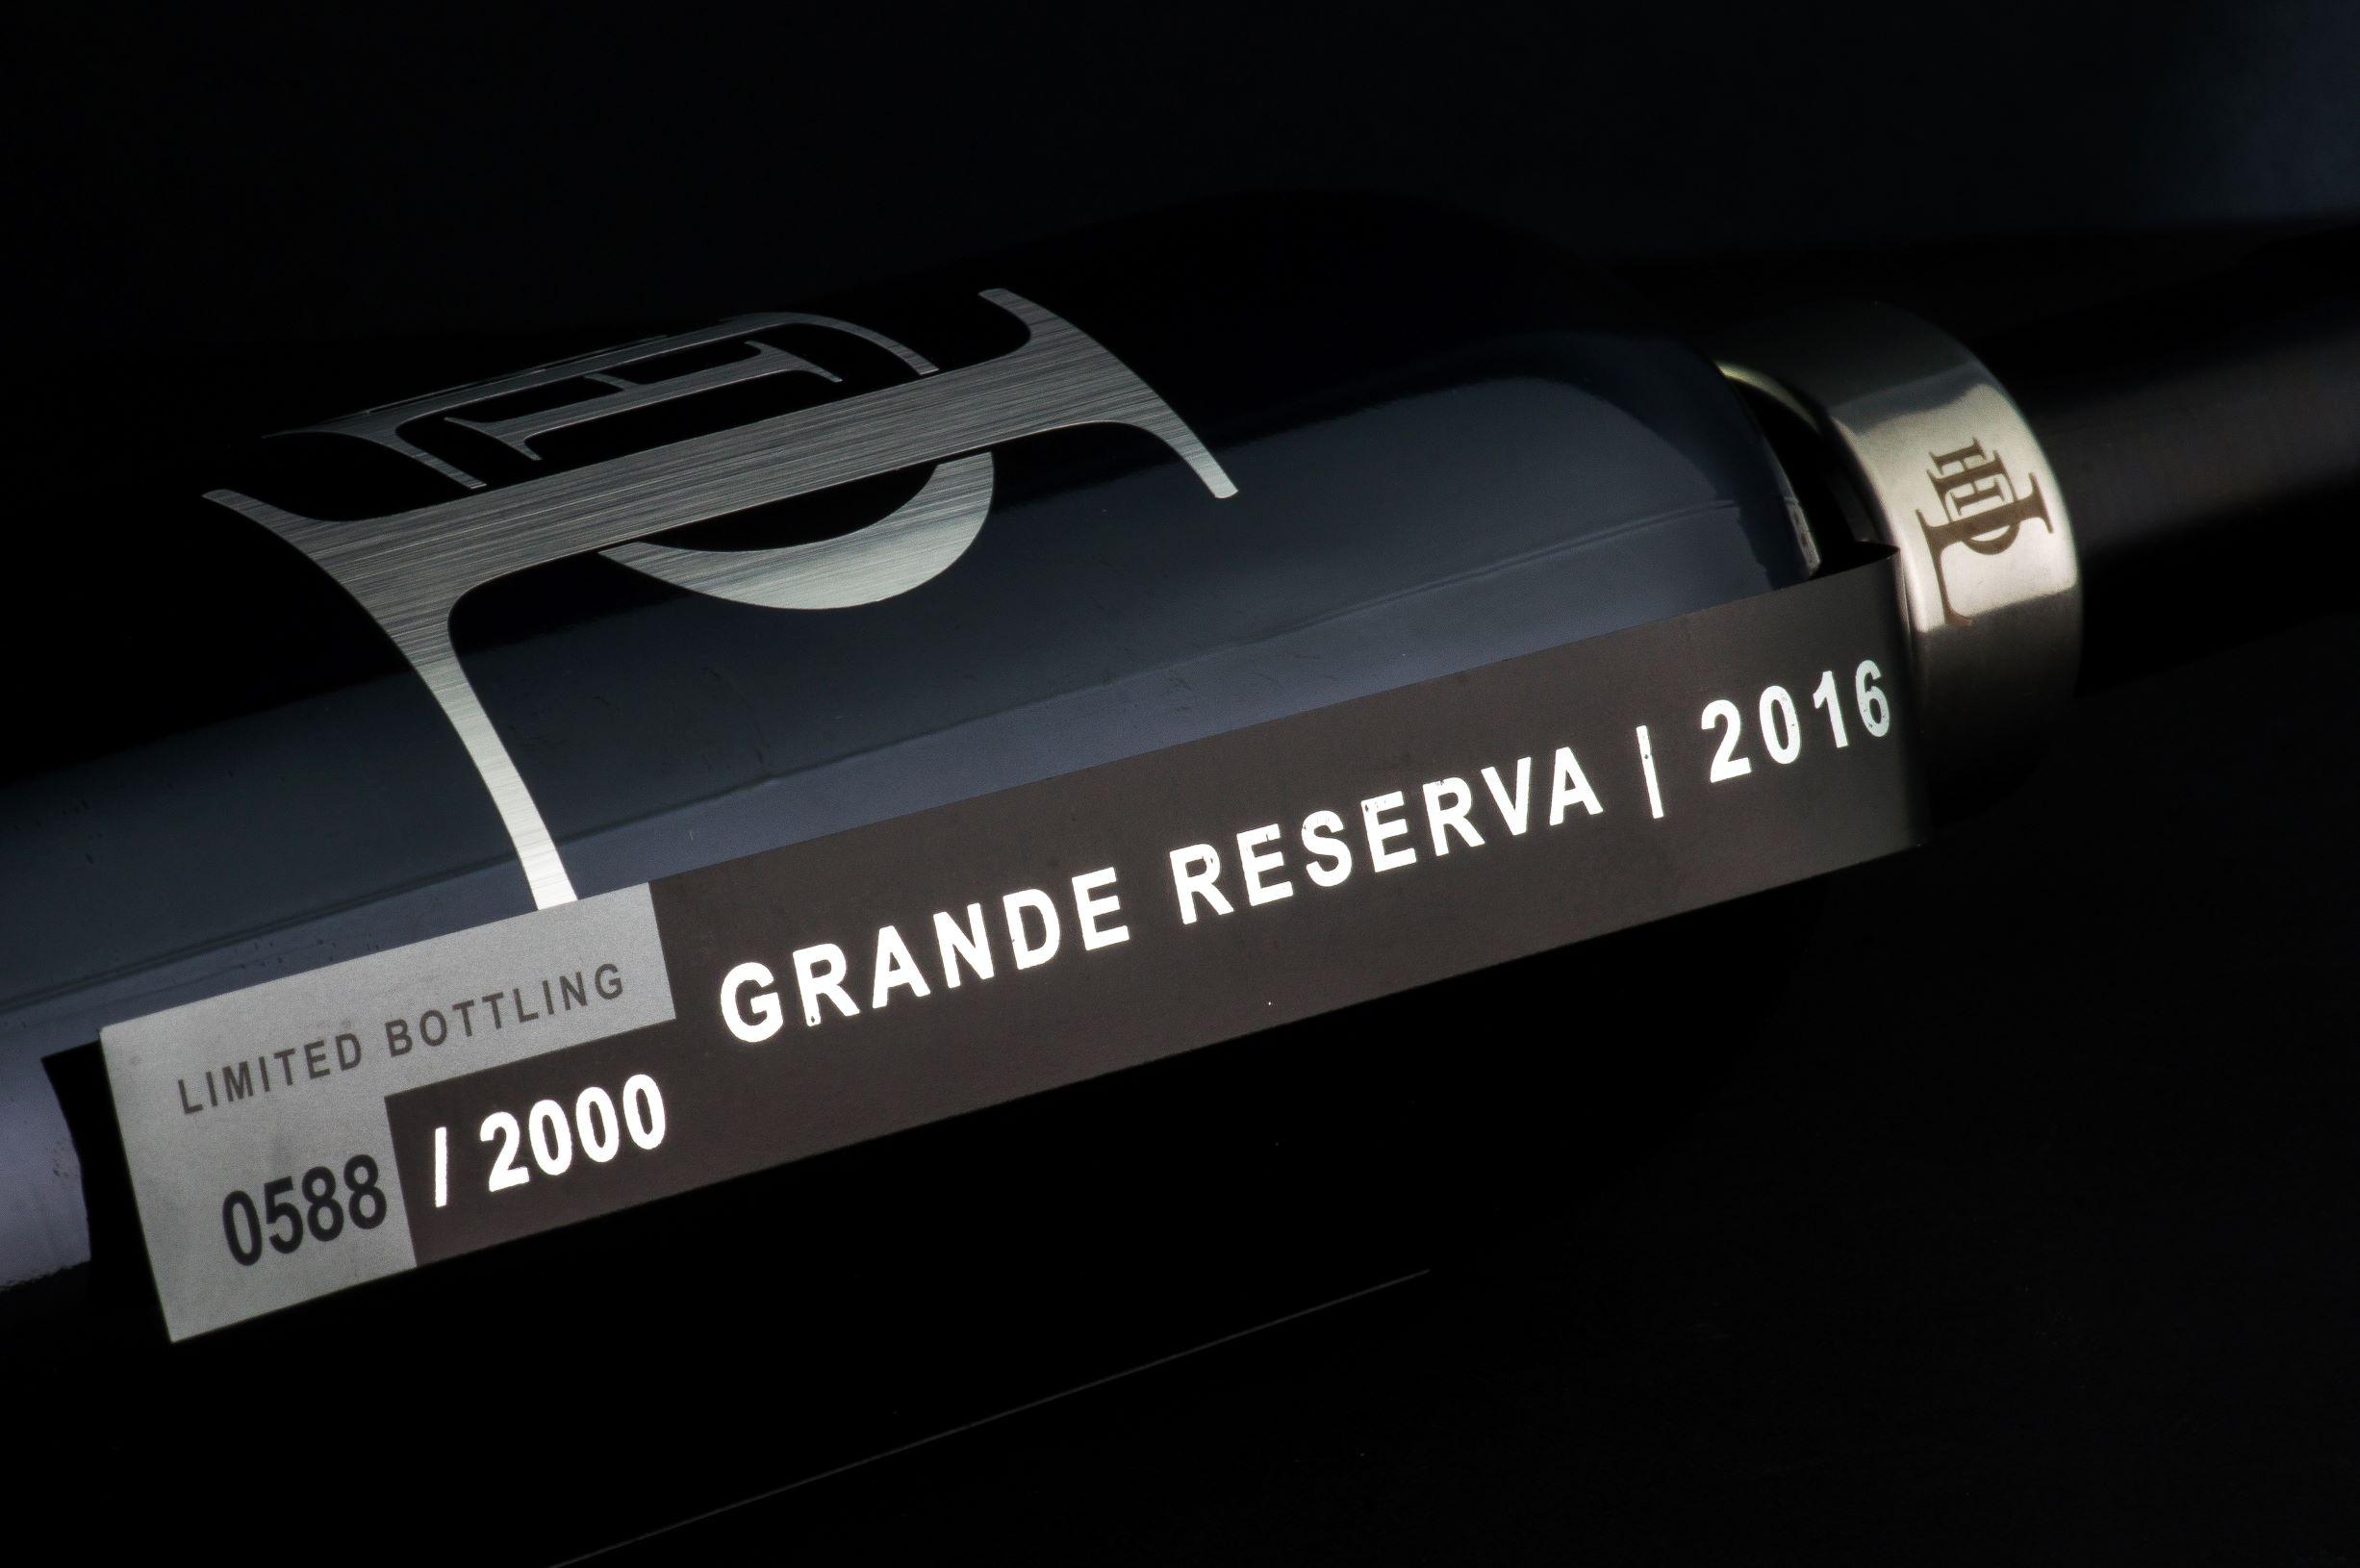 HDL Grande Reserva 2016